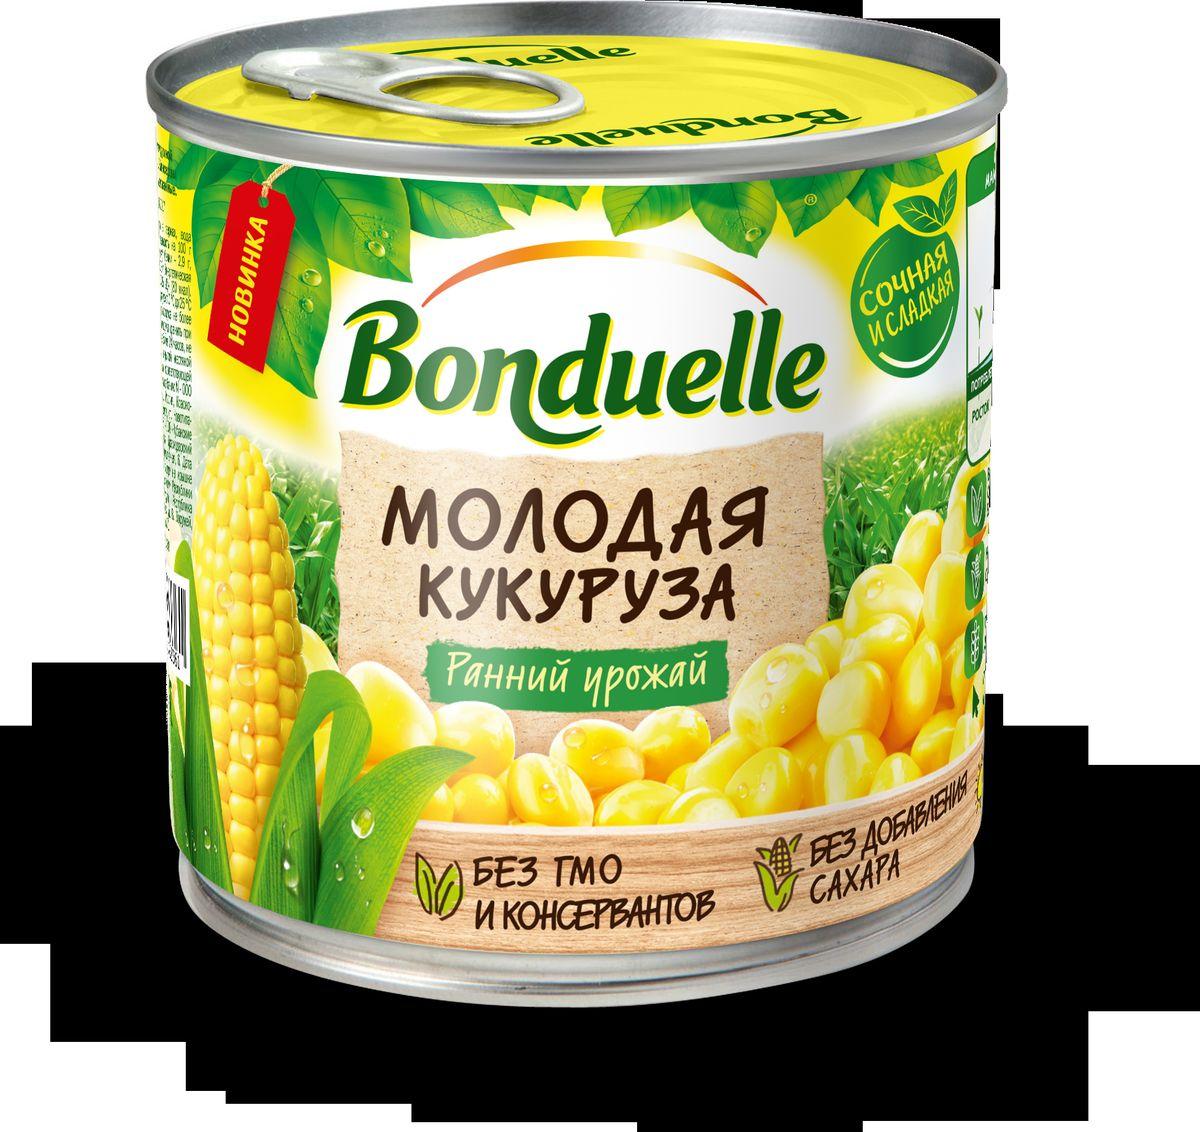 Bonduelle Кукуруза молодая, 170 г